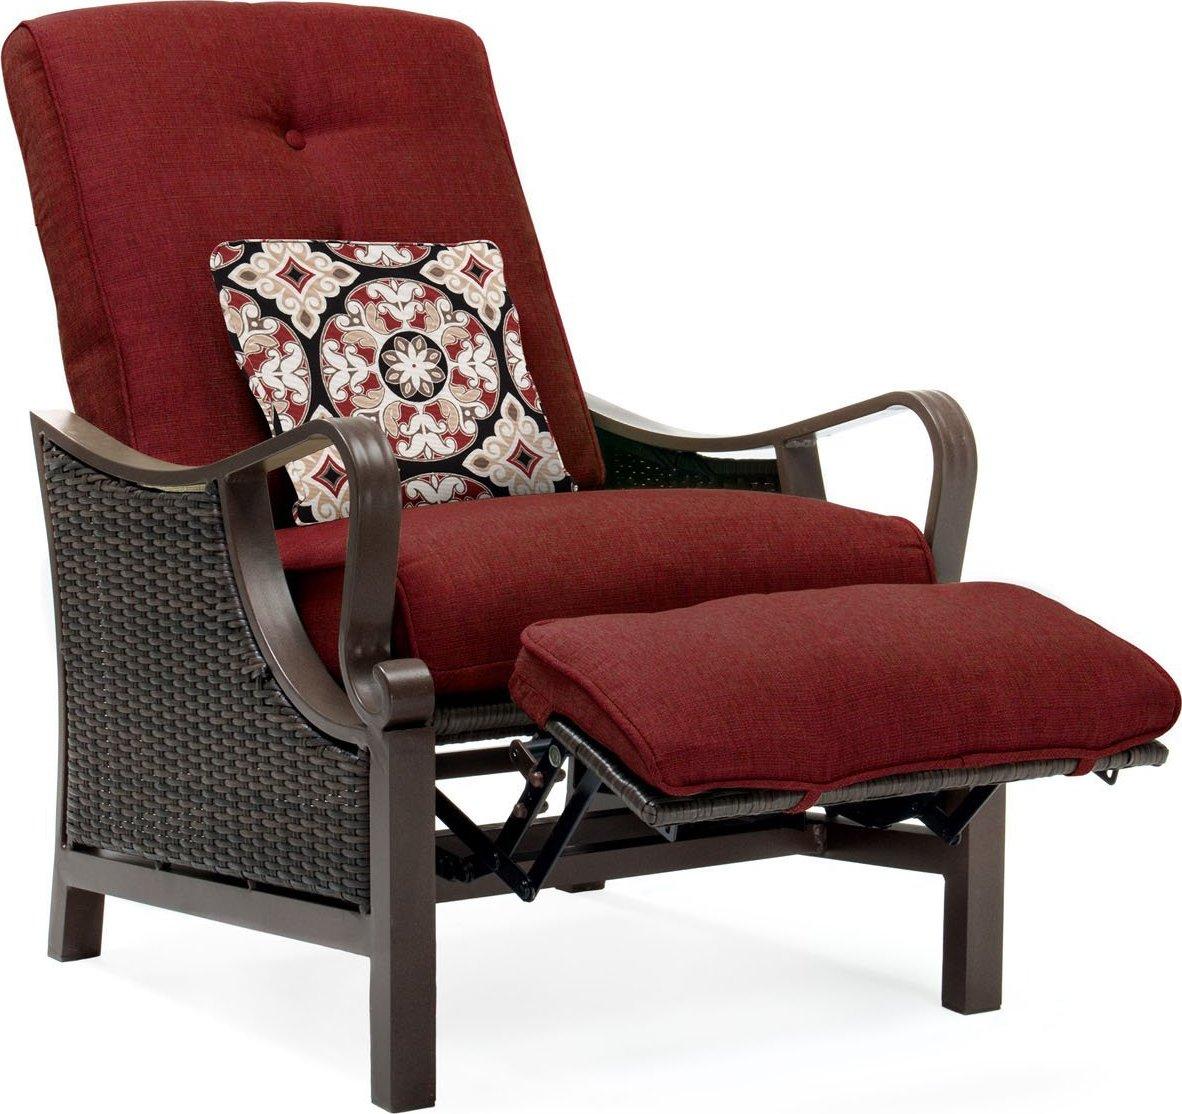 amazon recliner chairs burnt orange kitchen chair cushions hanover ventura luxury resin wicker outdoor